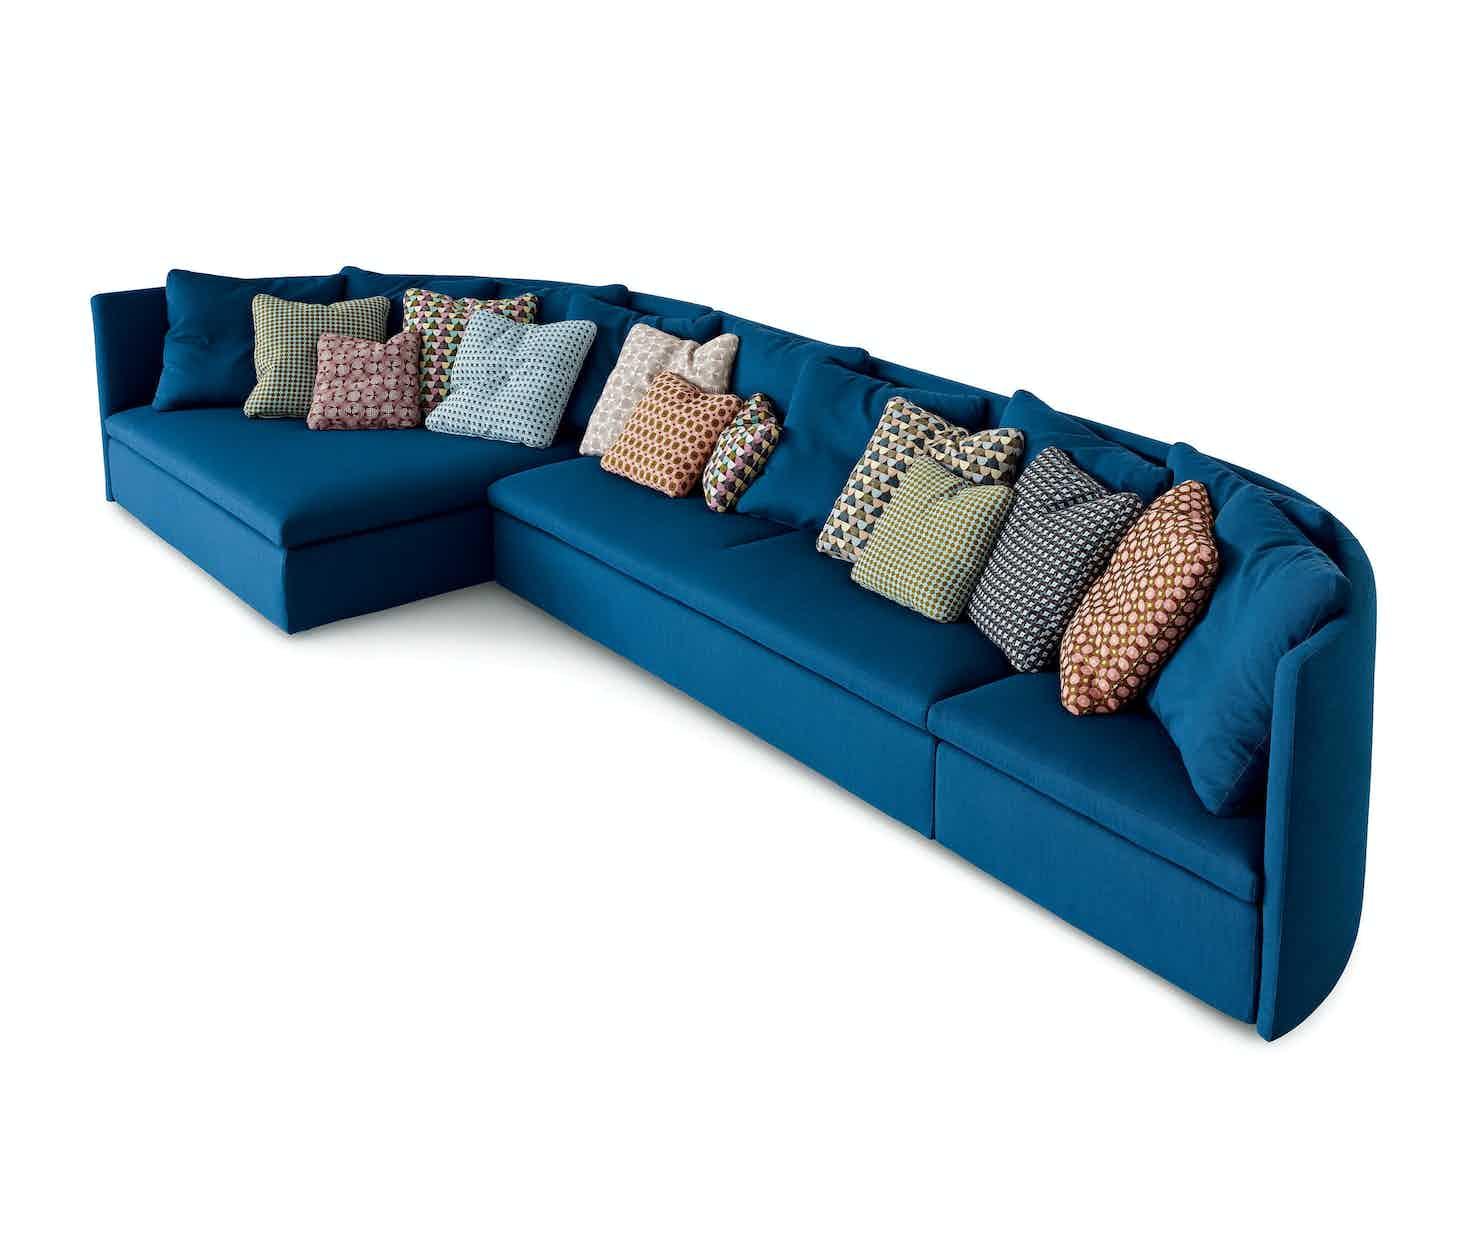 Arflex Mangold Blue Modular Sofa Angle Haute Living